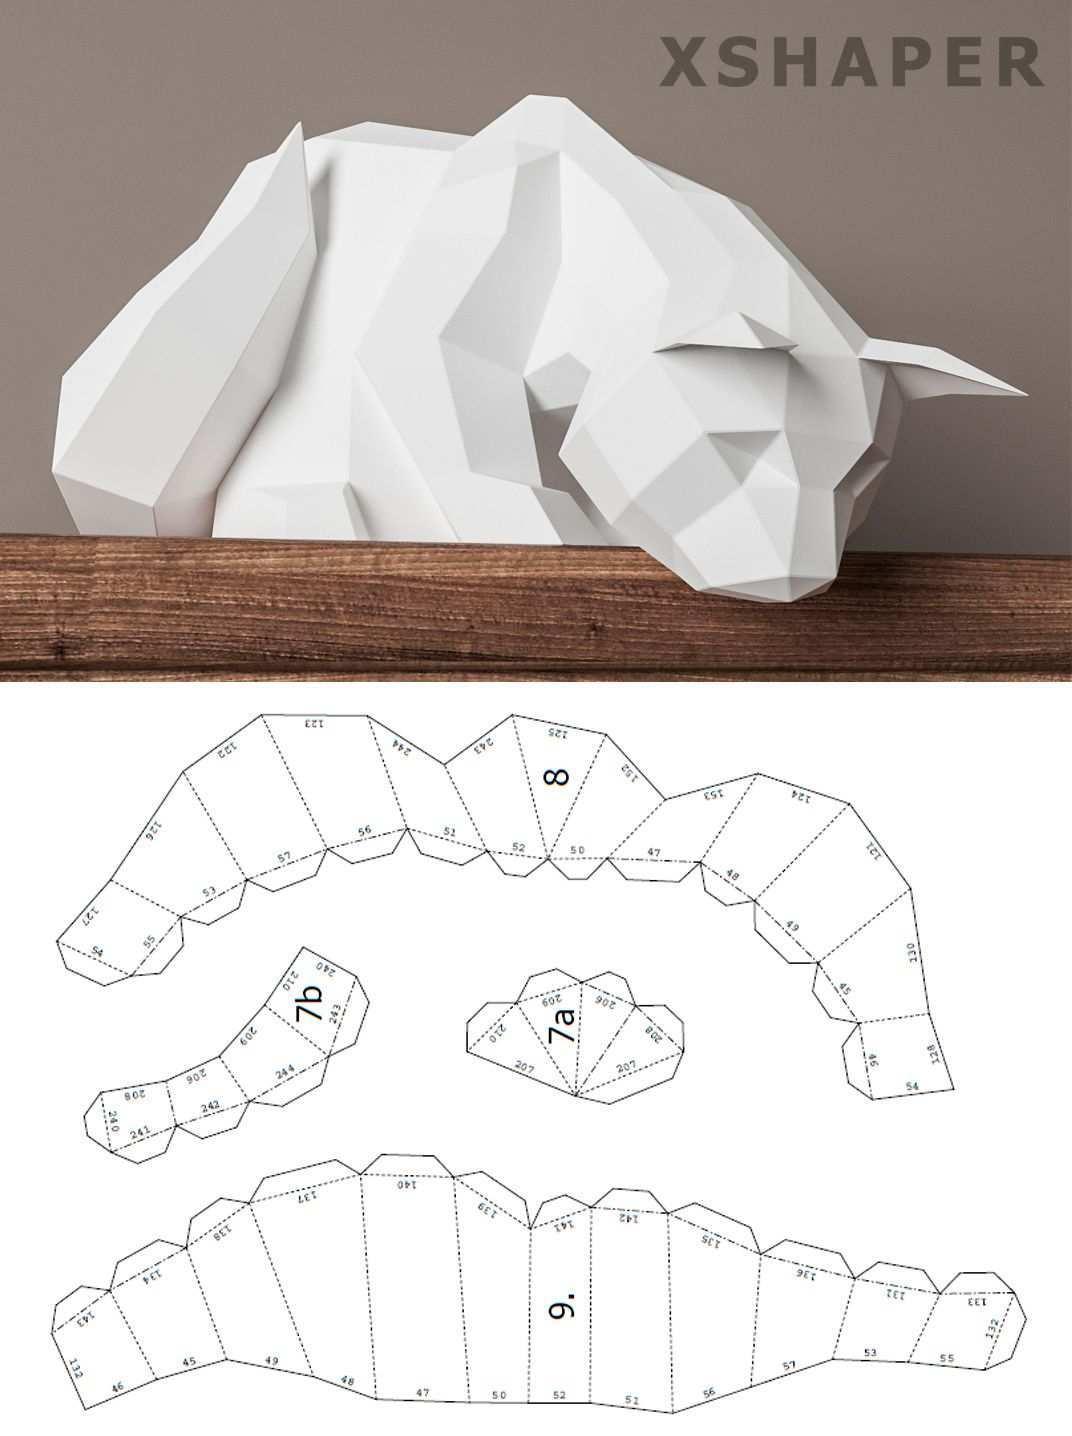 Papercraft Cat 3d Origami Pdf Template Animal Pet Paper Etsy Paper Crafts Diy Tutorials Origami Easy Paper Crafts